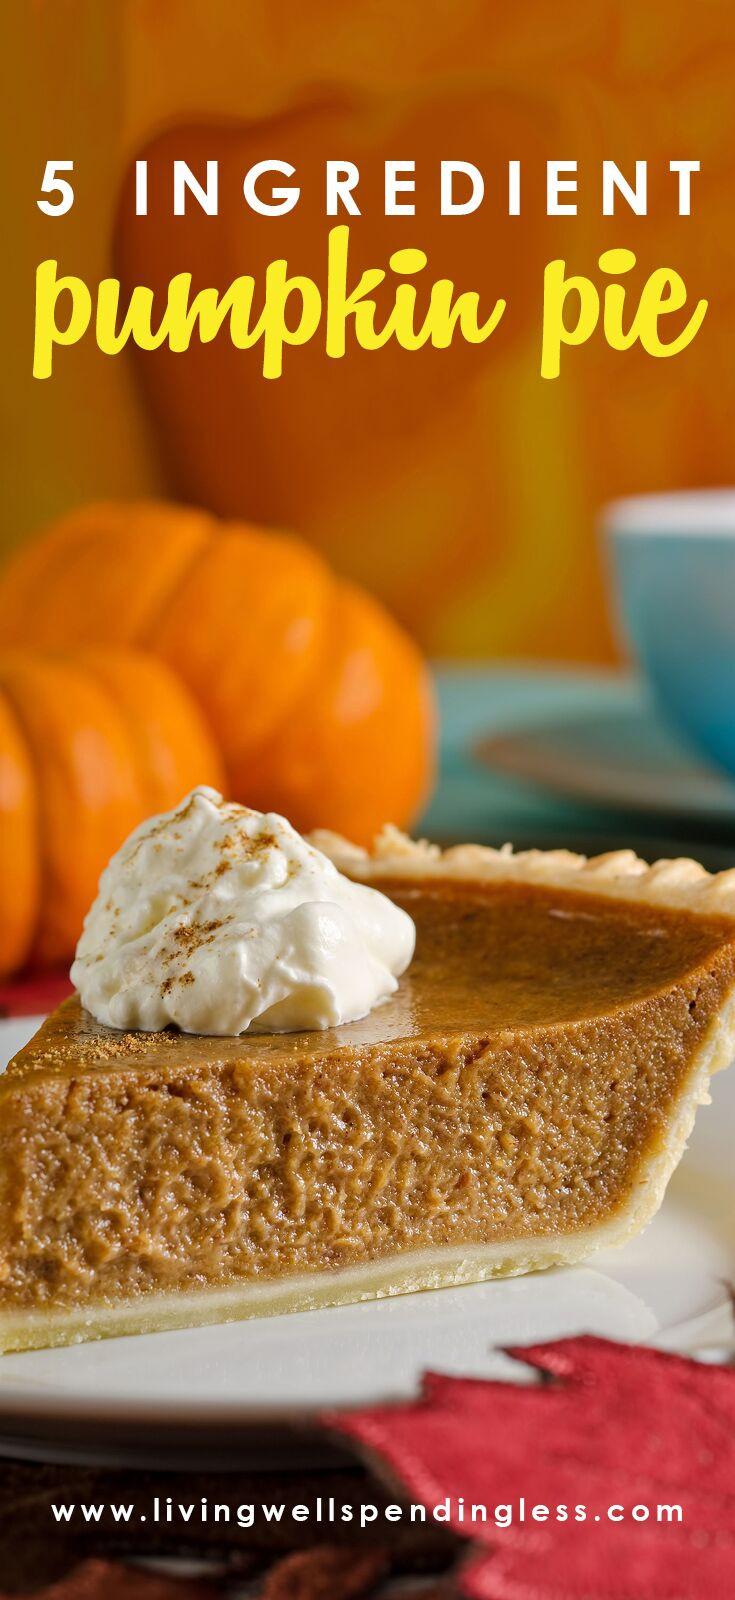 Easy Pumpkin Pie Recipe  Five Ingre nt Easy Pumpkin Pie Recipe